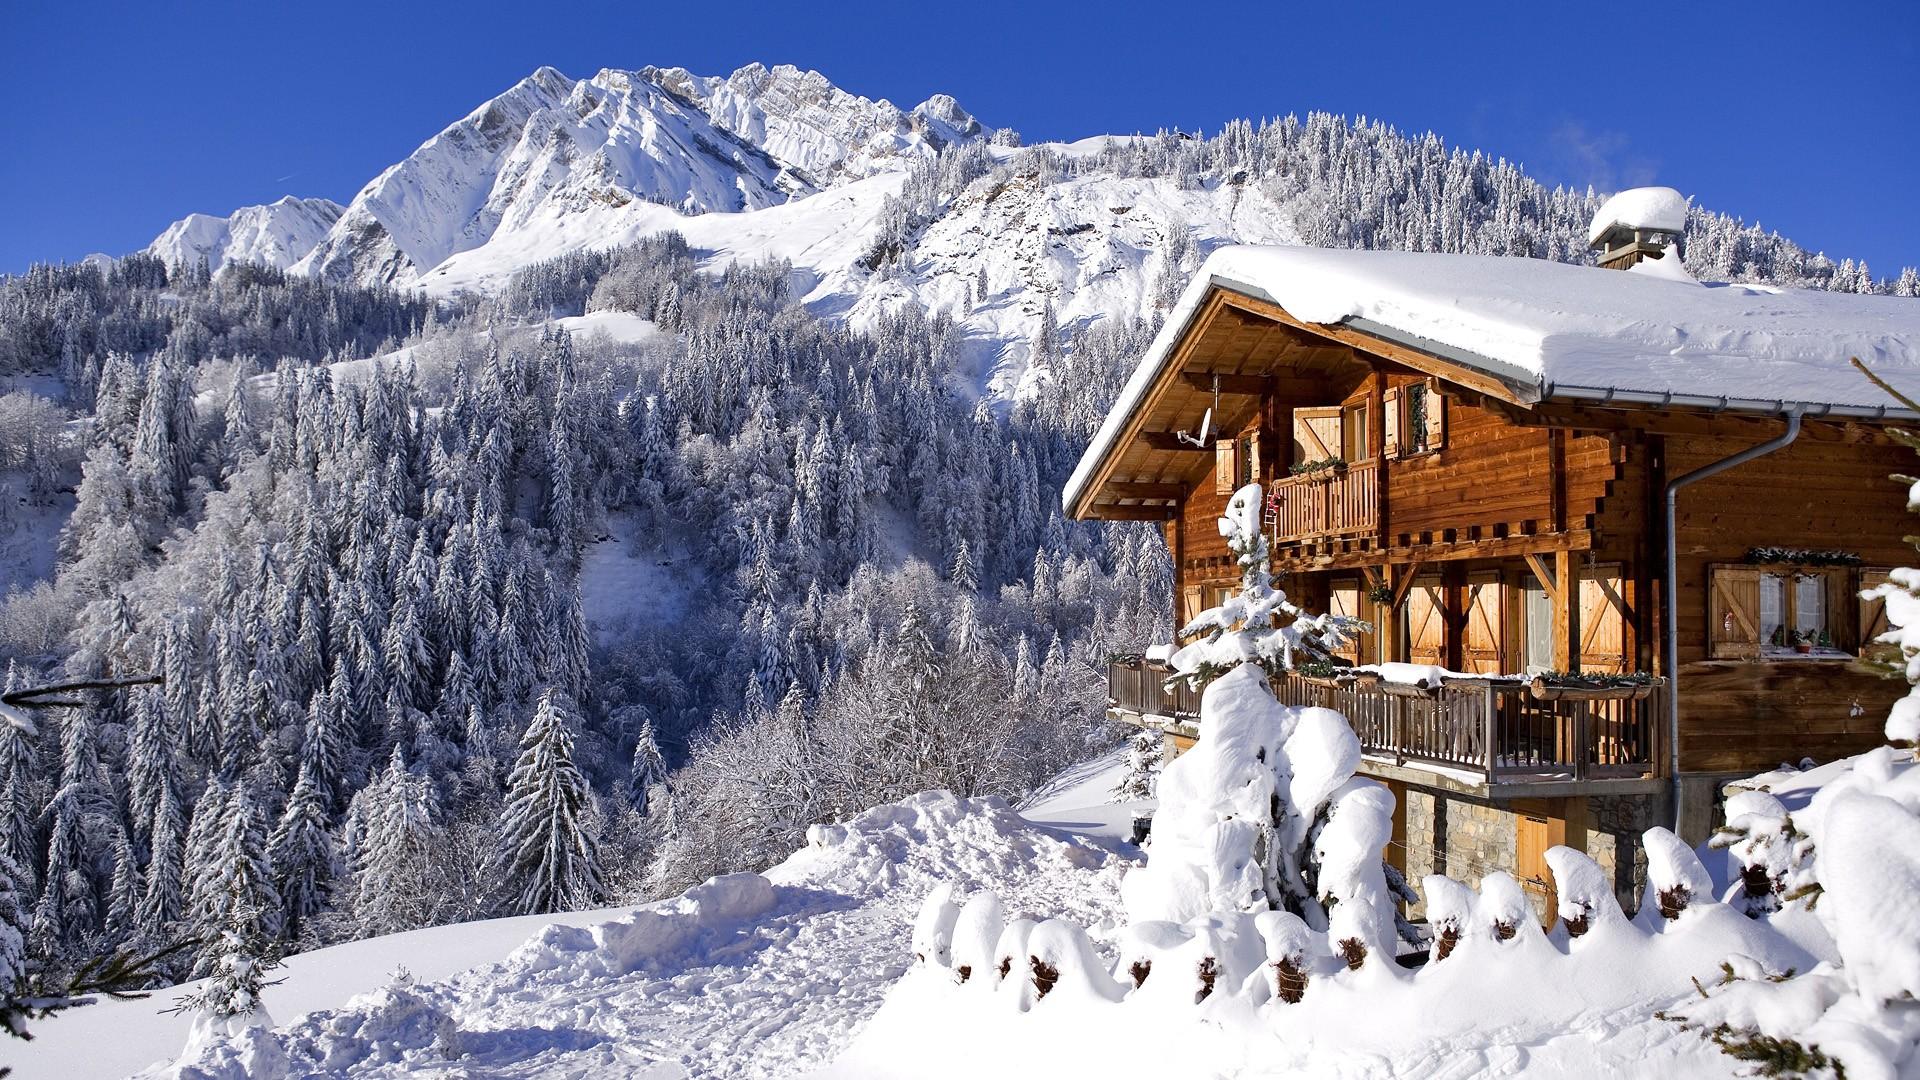 winter-gc-com-images-landscapes-nature-winter-snow-france-alps-wallpaper-wp4210714